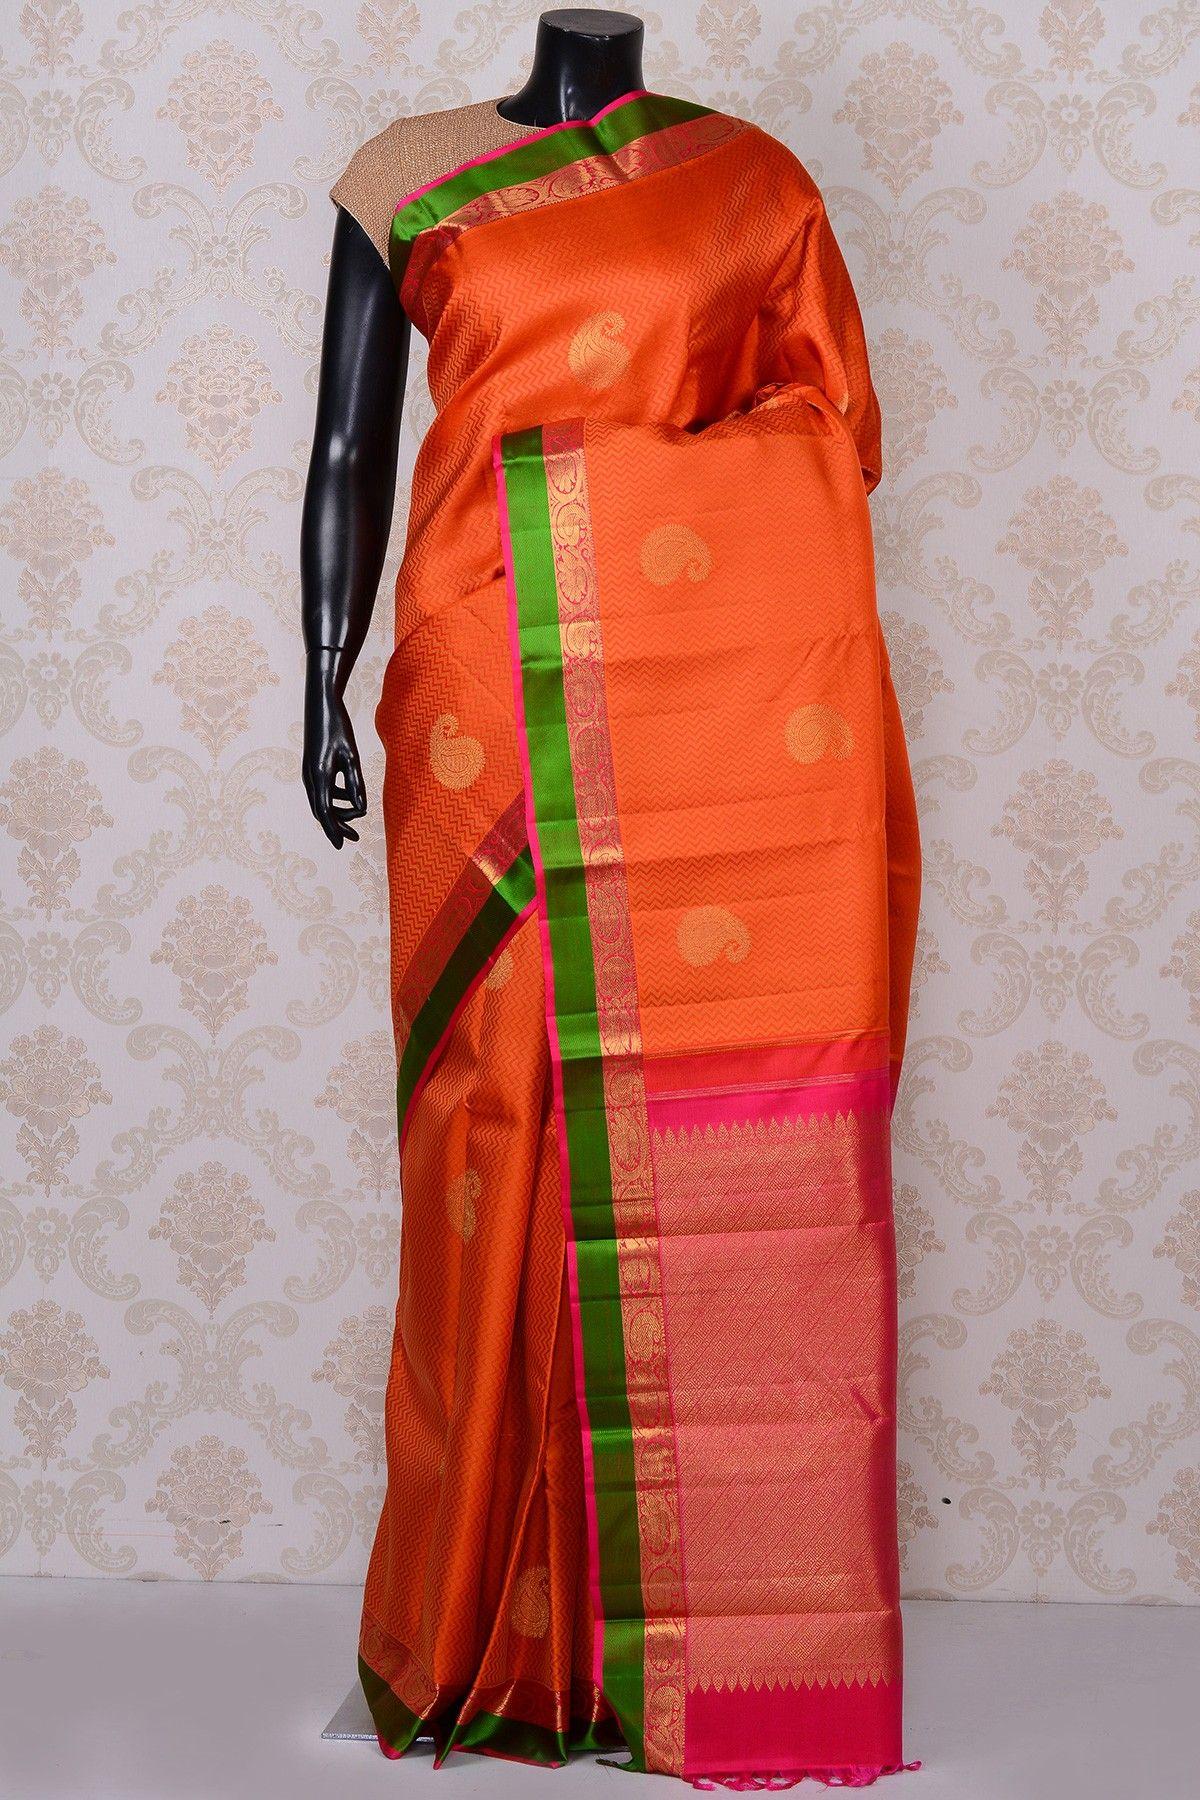 cbde7f8260f97a  Orange gorgeous  kanchipuram silk  saree with green border-SR18624 -  PURE KANCHIPURAM  SILK SAREE  Sarees